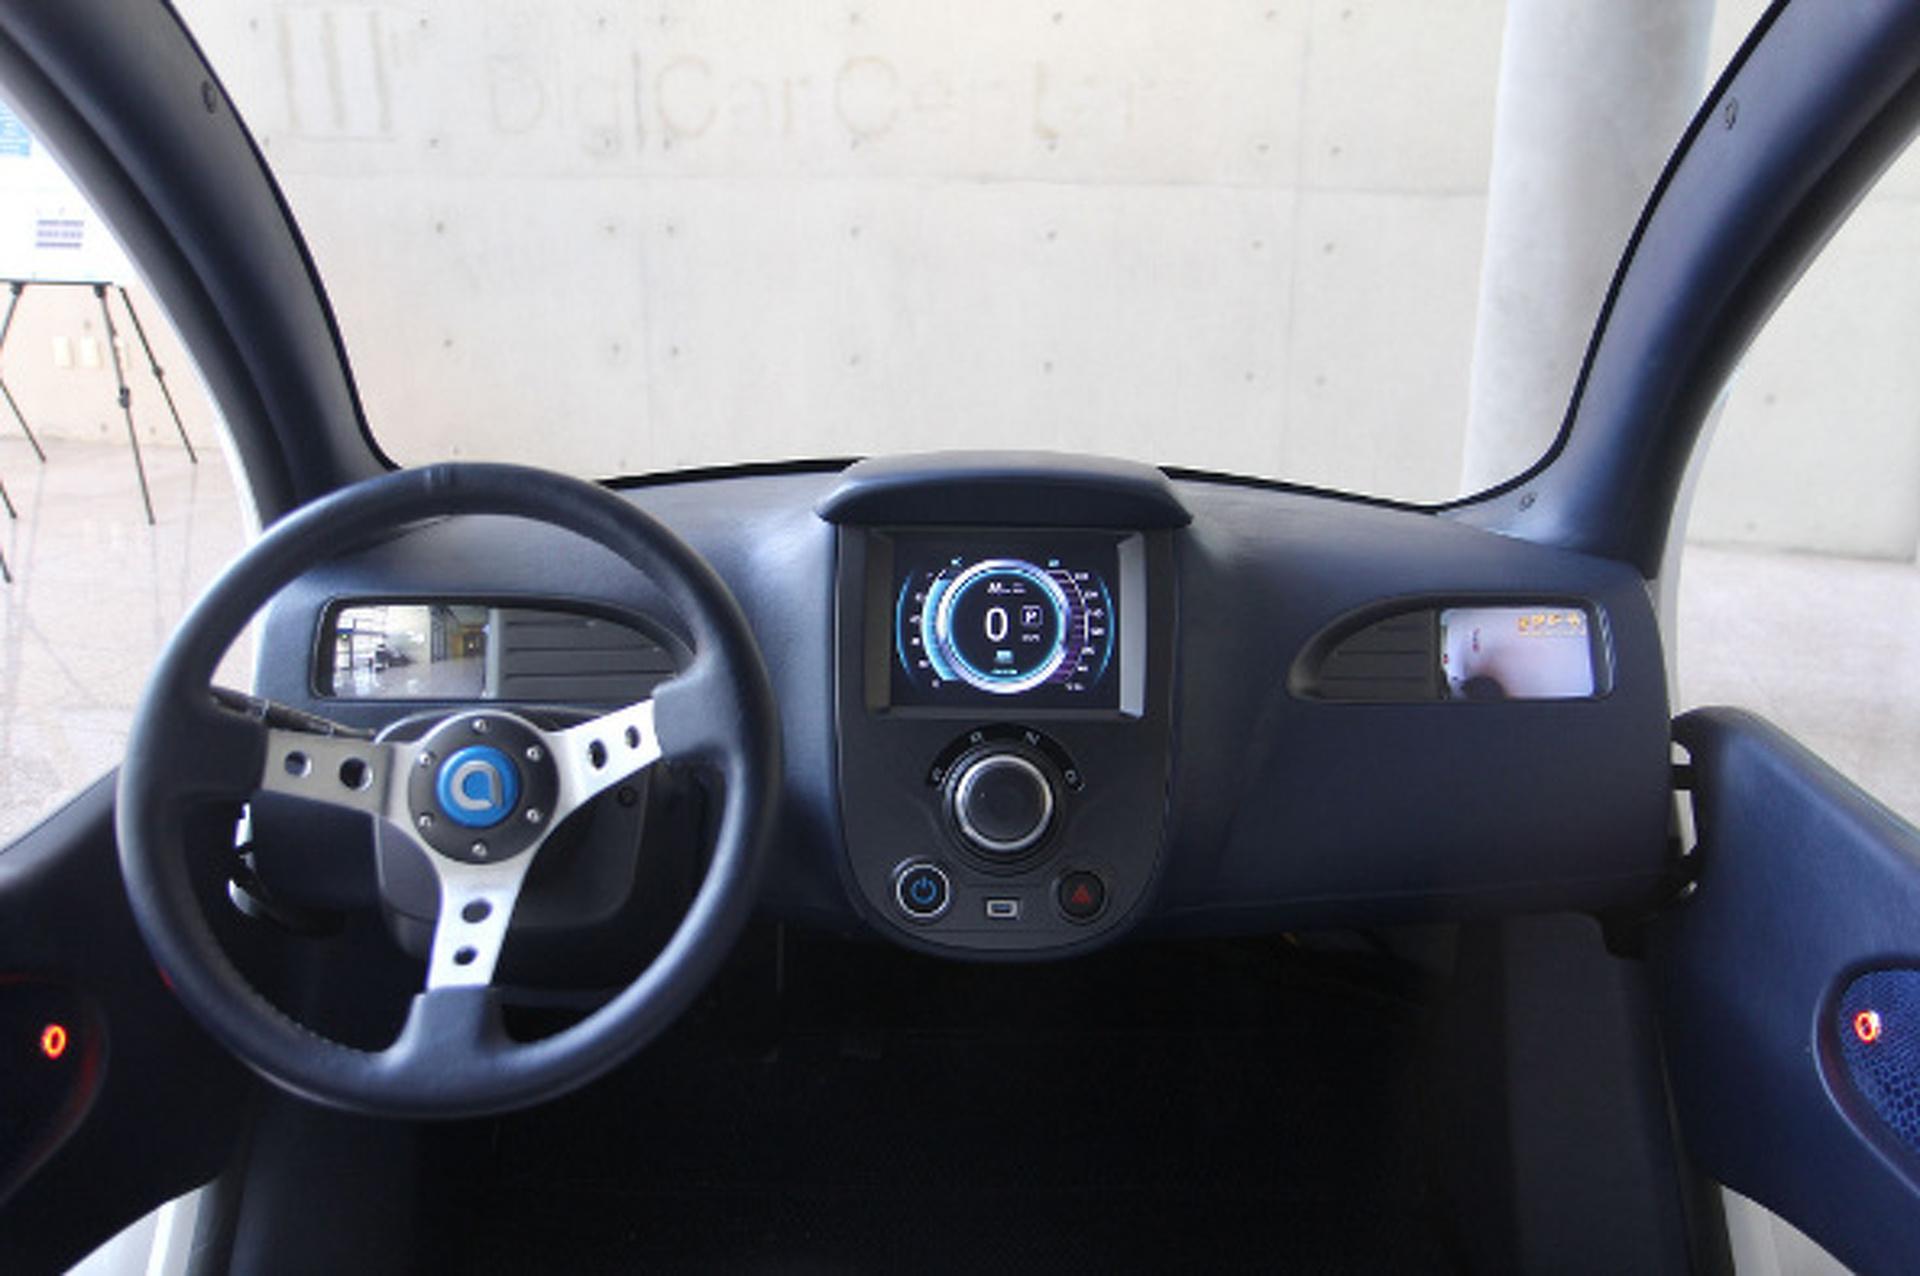 Korean Group Develops Folding Electric City Car